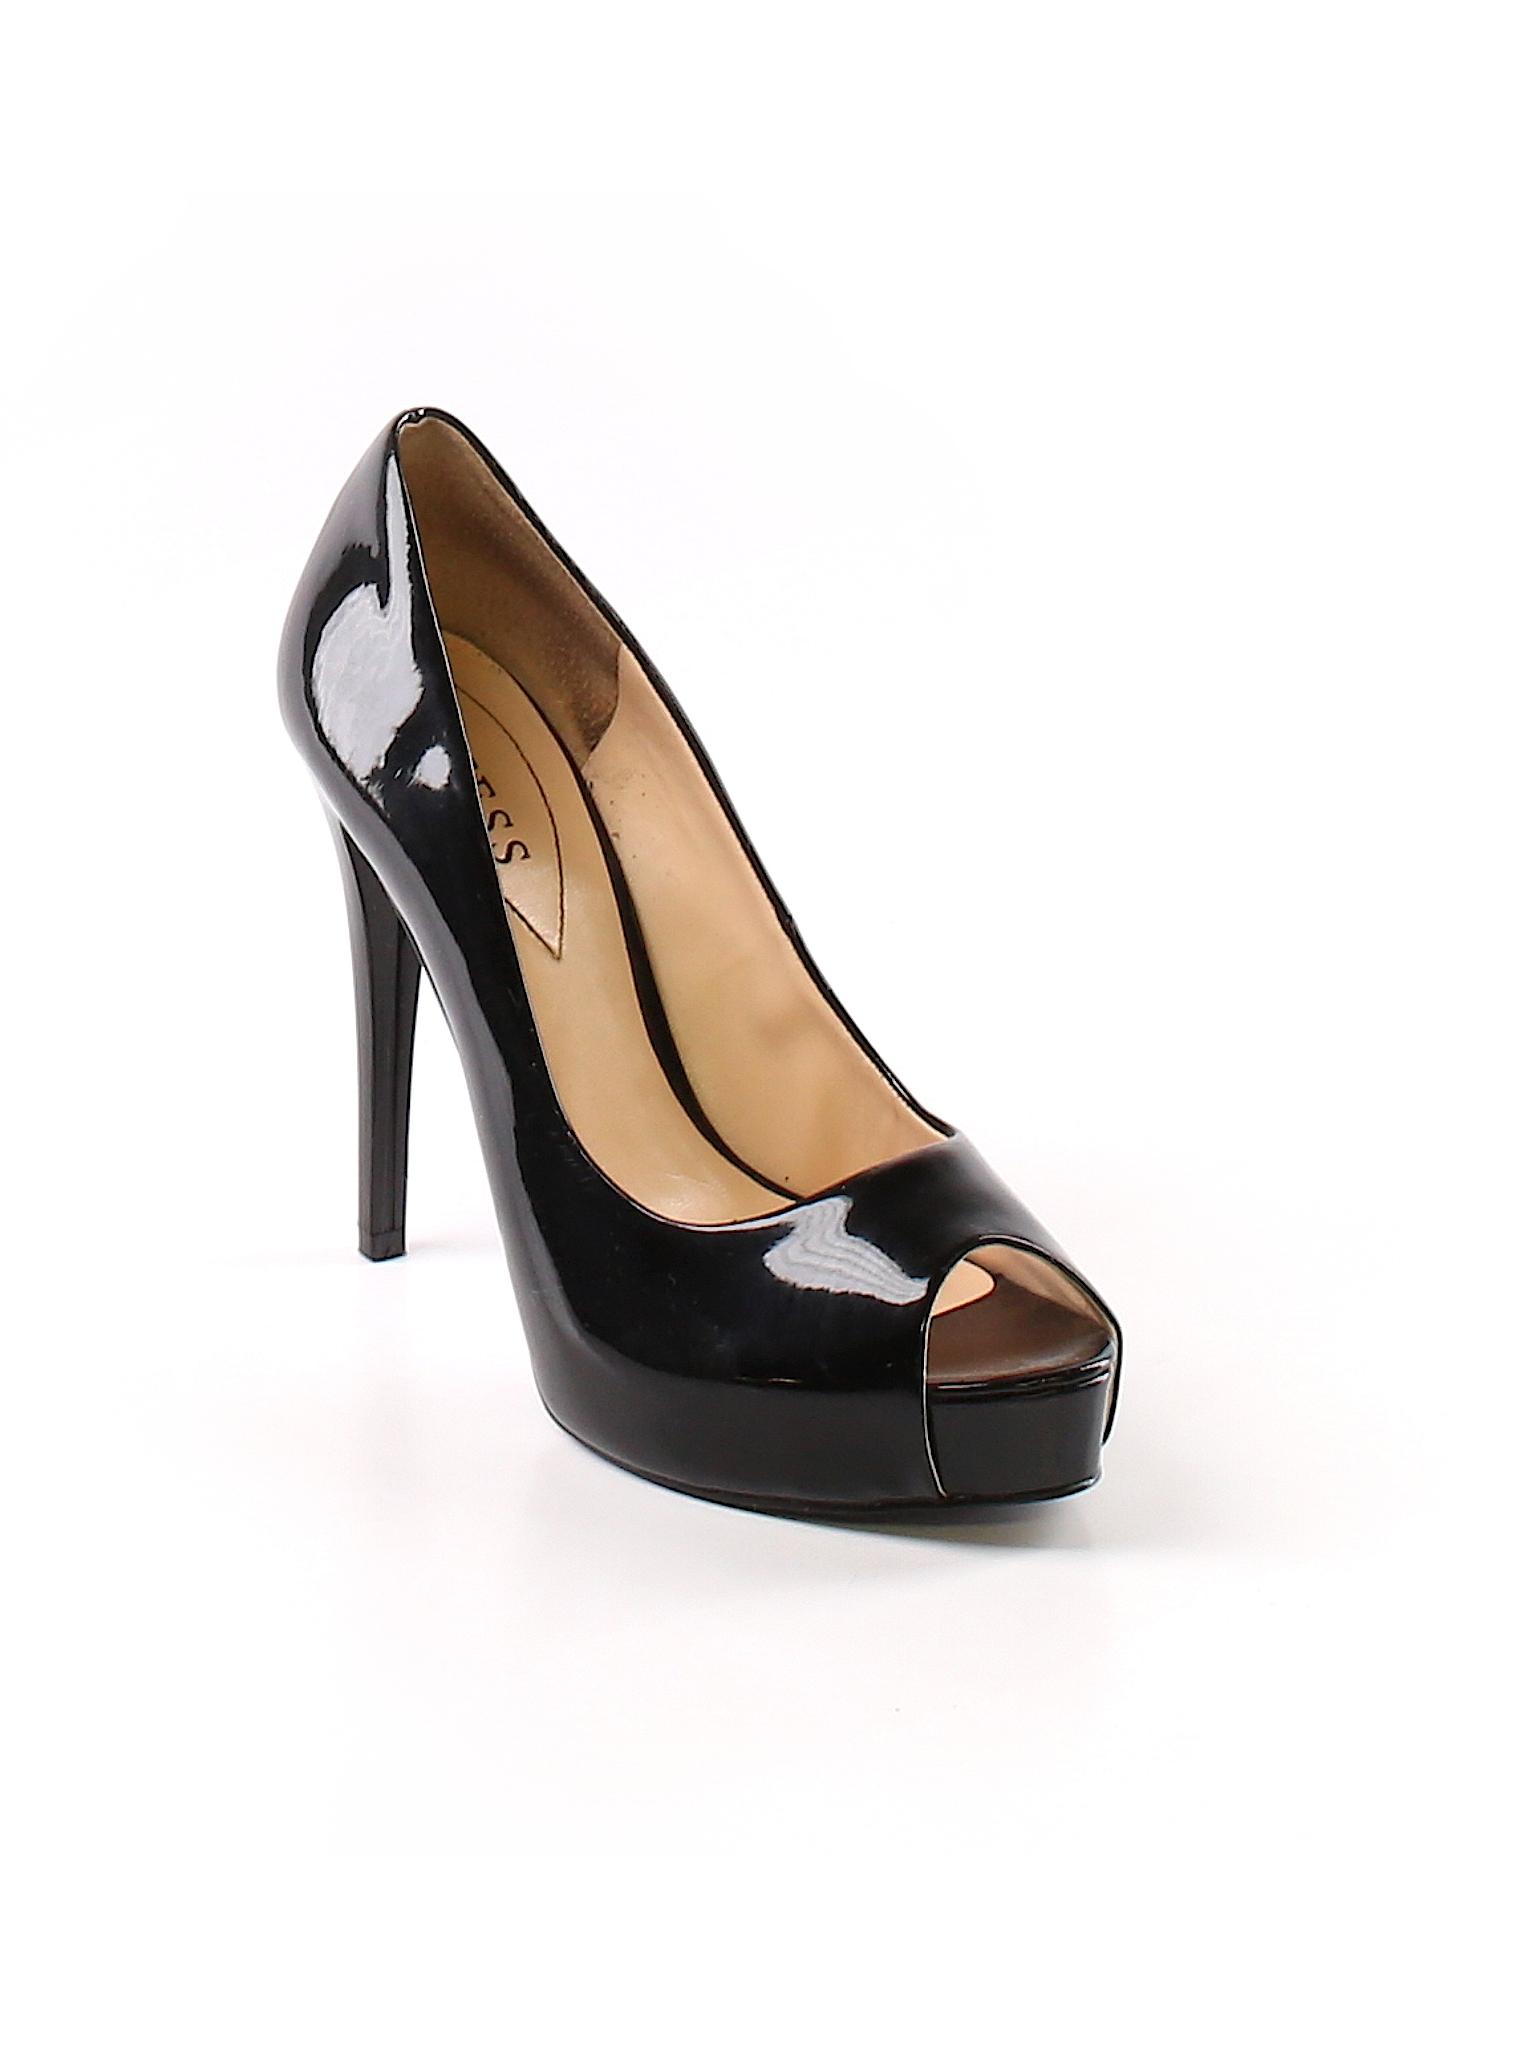 promotion Boutique promotion Heels Heels promotion Guess Boutique promotion Heels Guess Boutique Guess Boutique Heels Guess tpqXwxtE